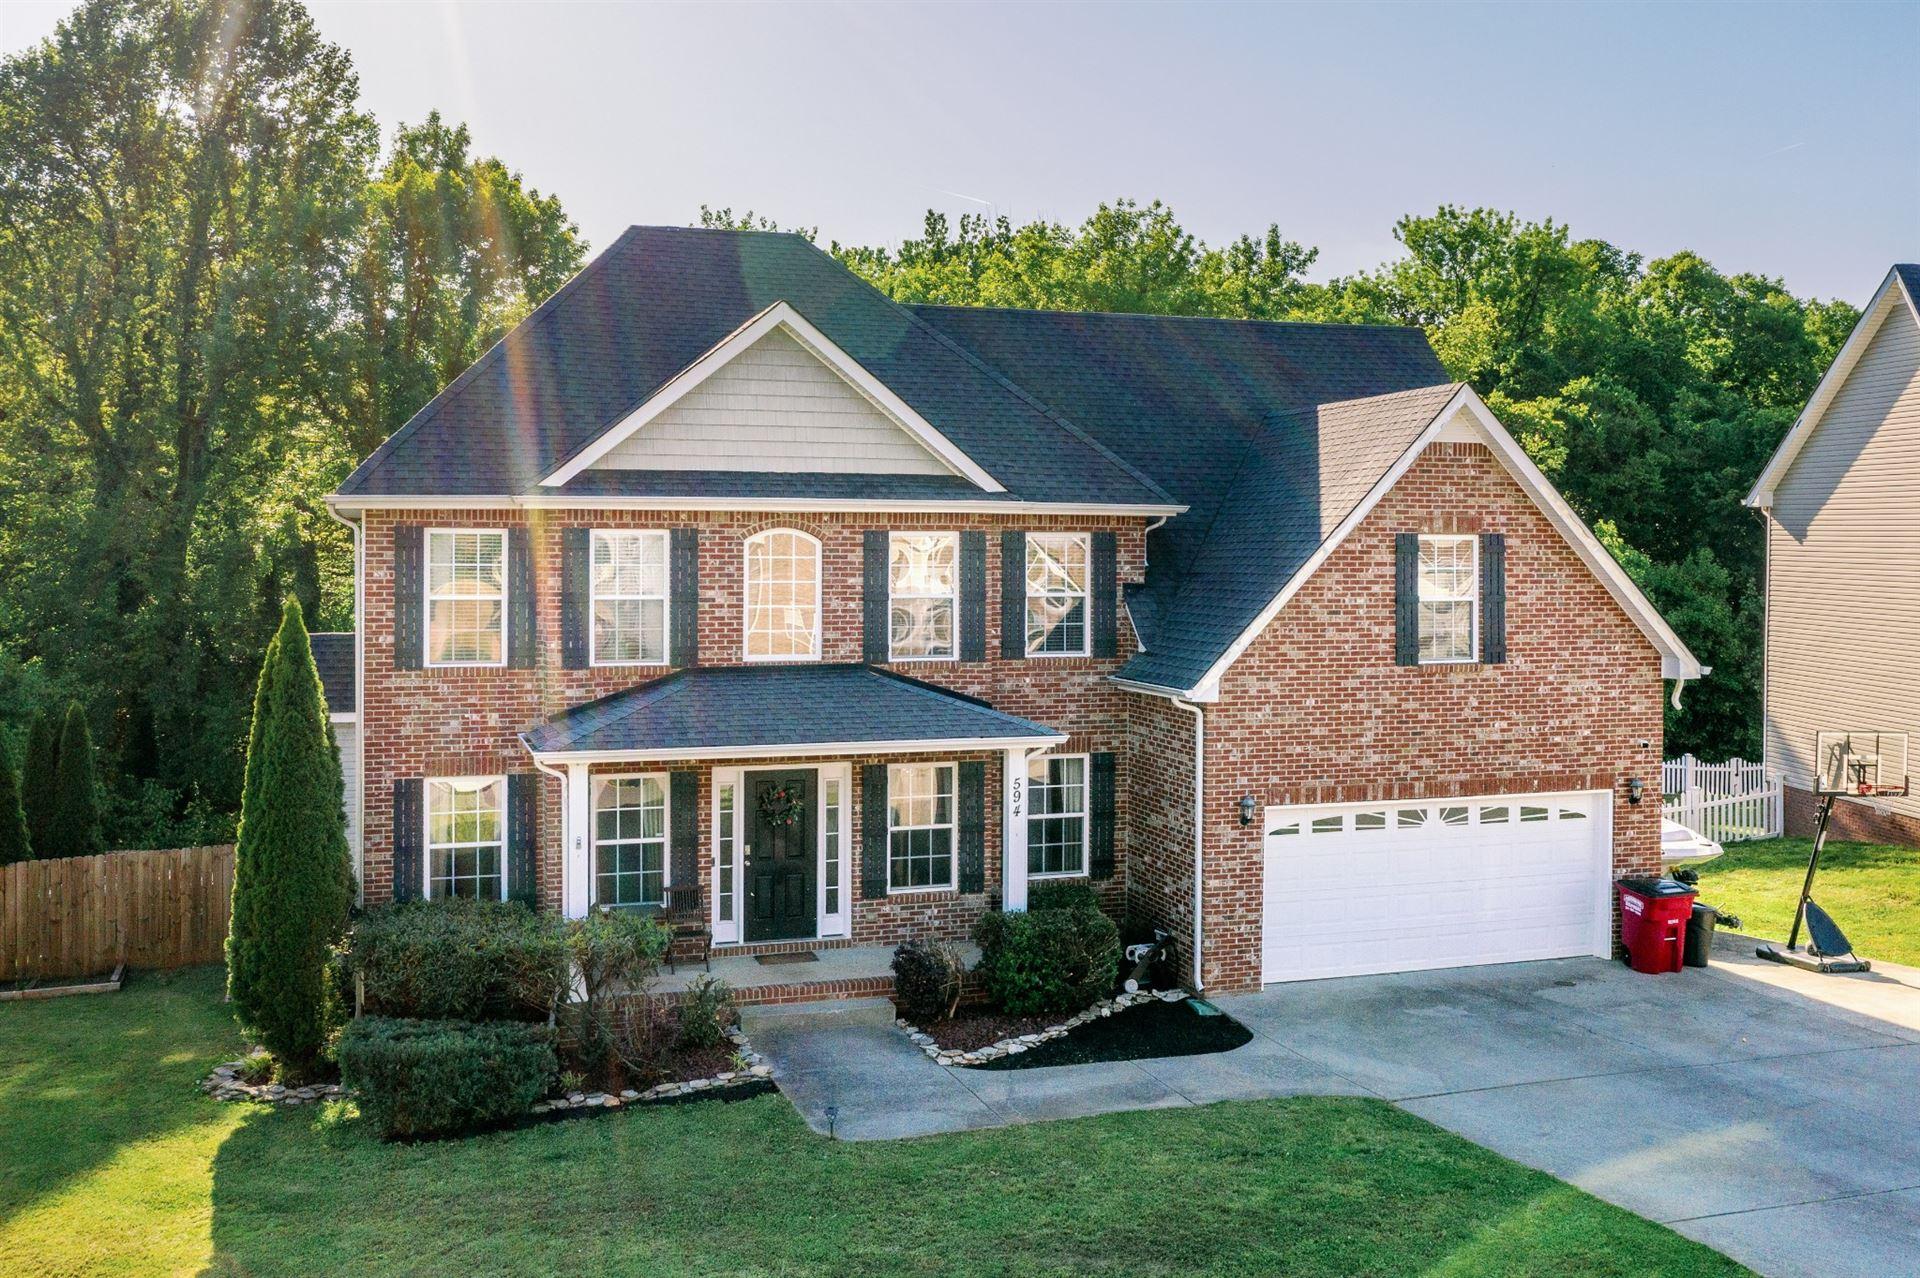 594 Winding Bluff Way, Clarksville, TN 37040 - MLS#: 2250186